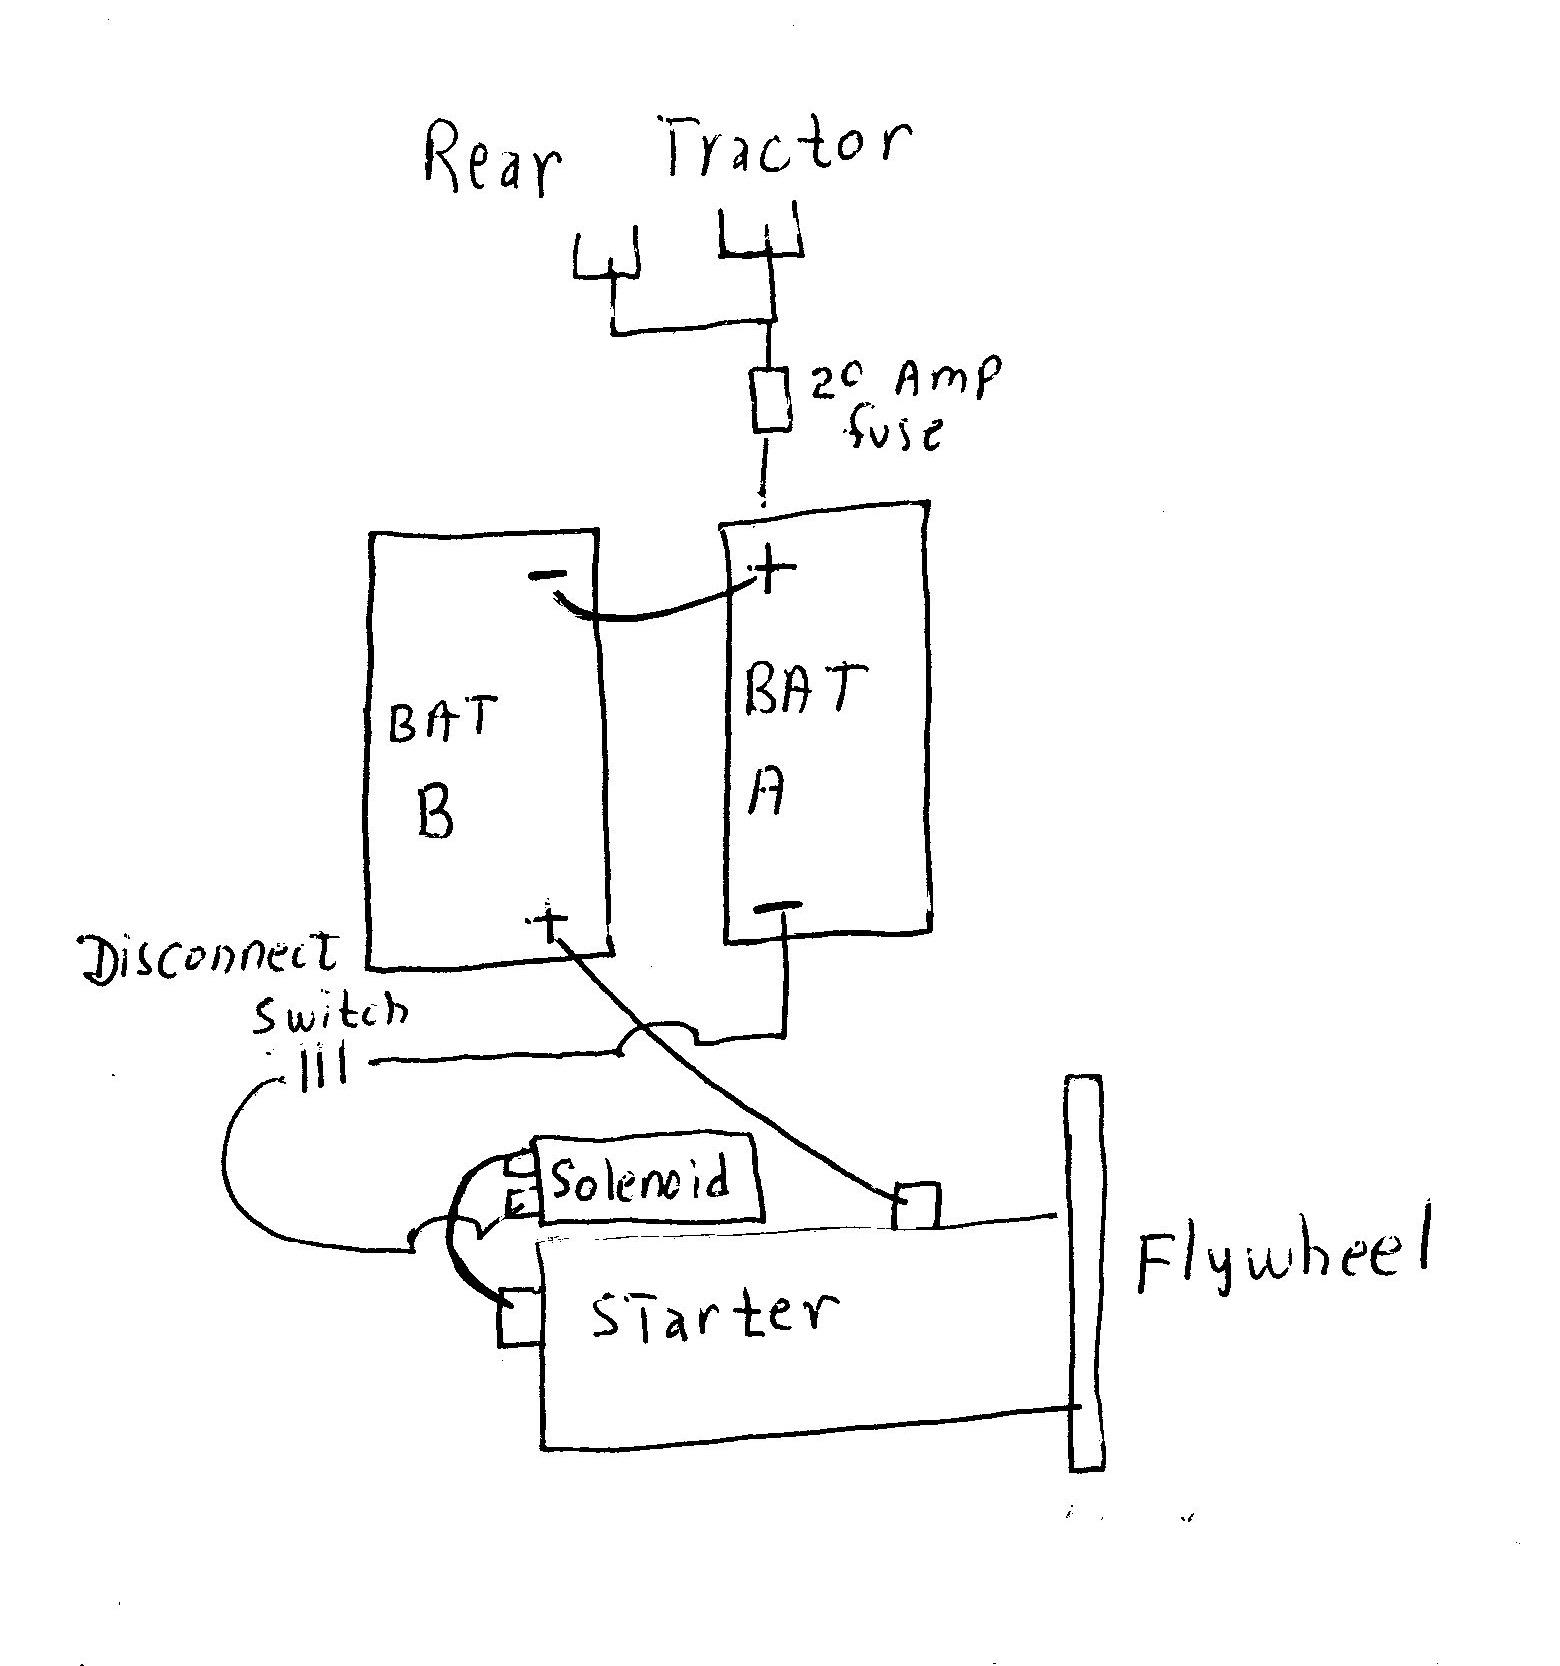 12 volt wiring diagram 12 volt electrical wiring charging